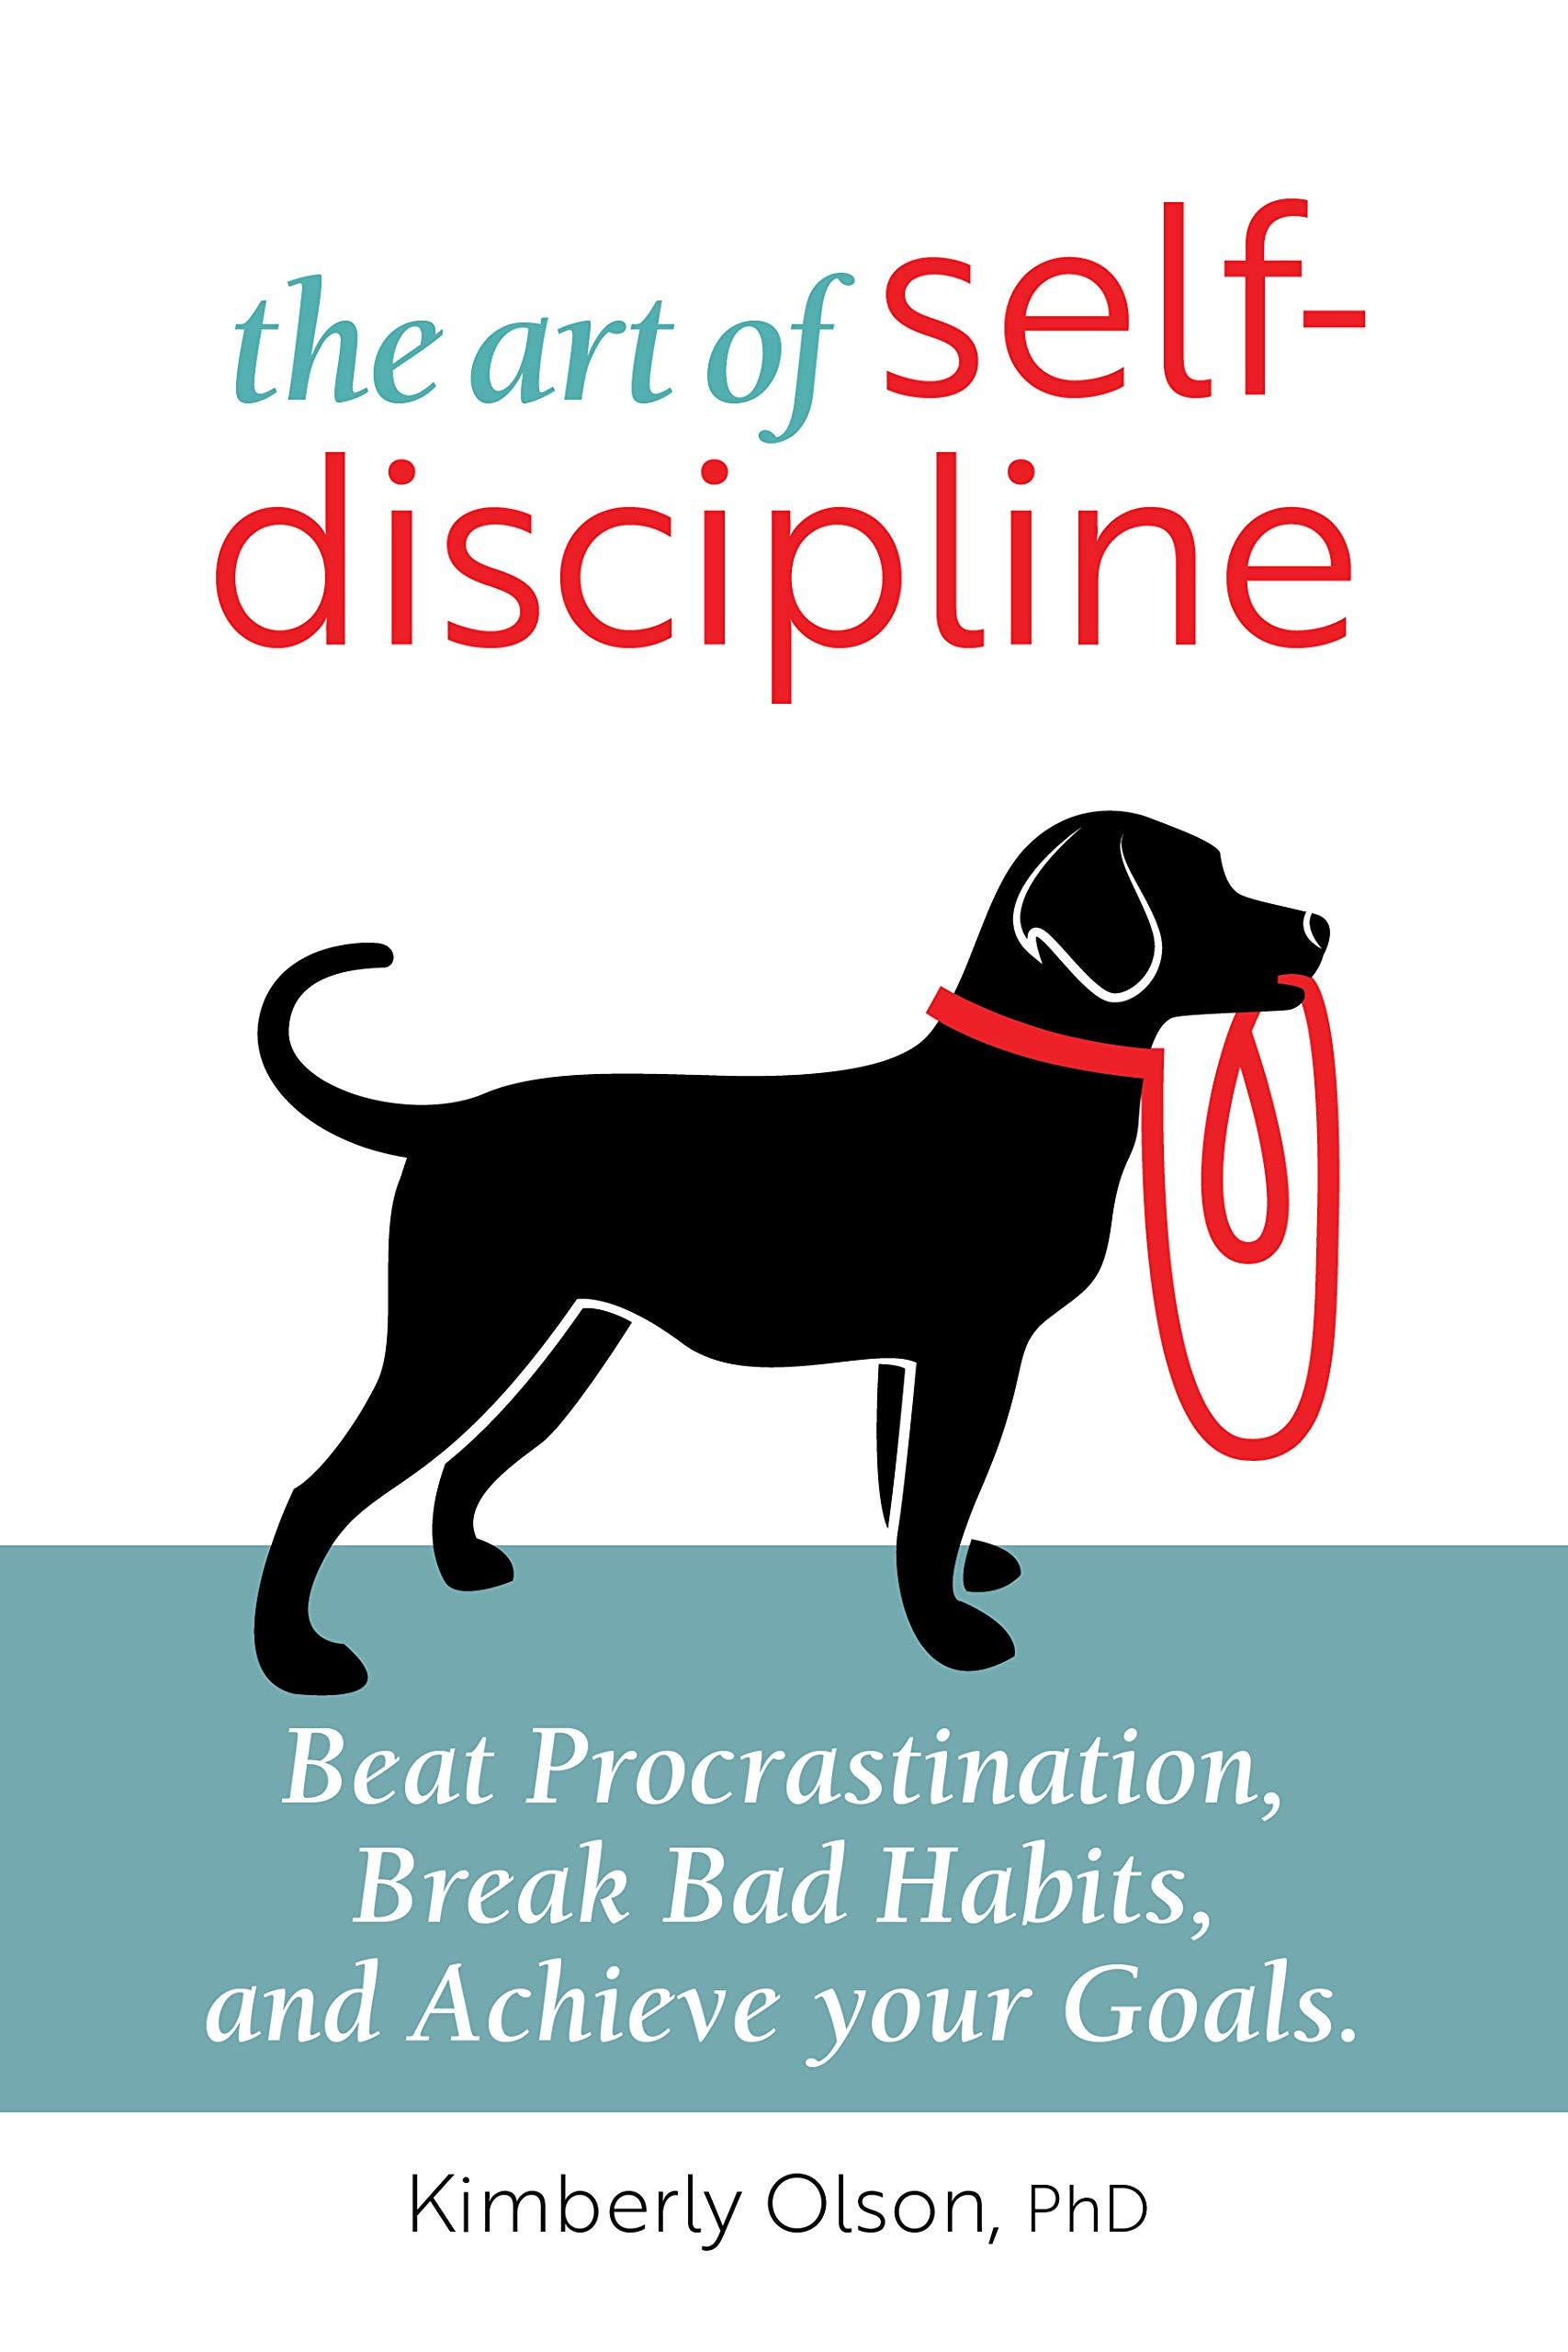 The Art of Self-Discipline: Beat Procrastination, Break Bad Habits, and Achieve Your Goals